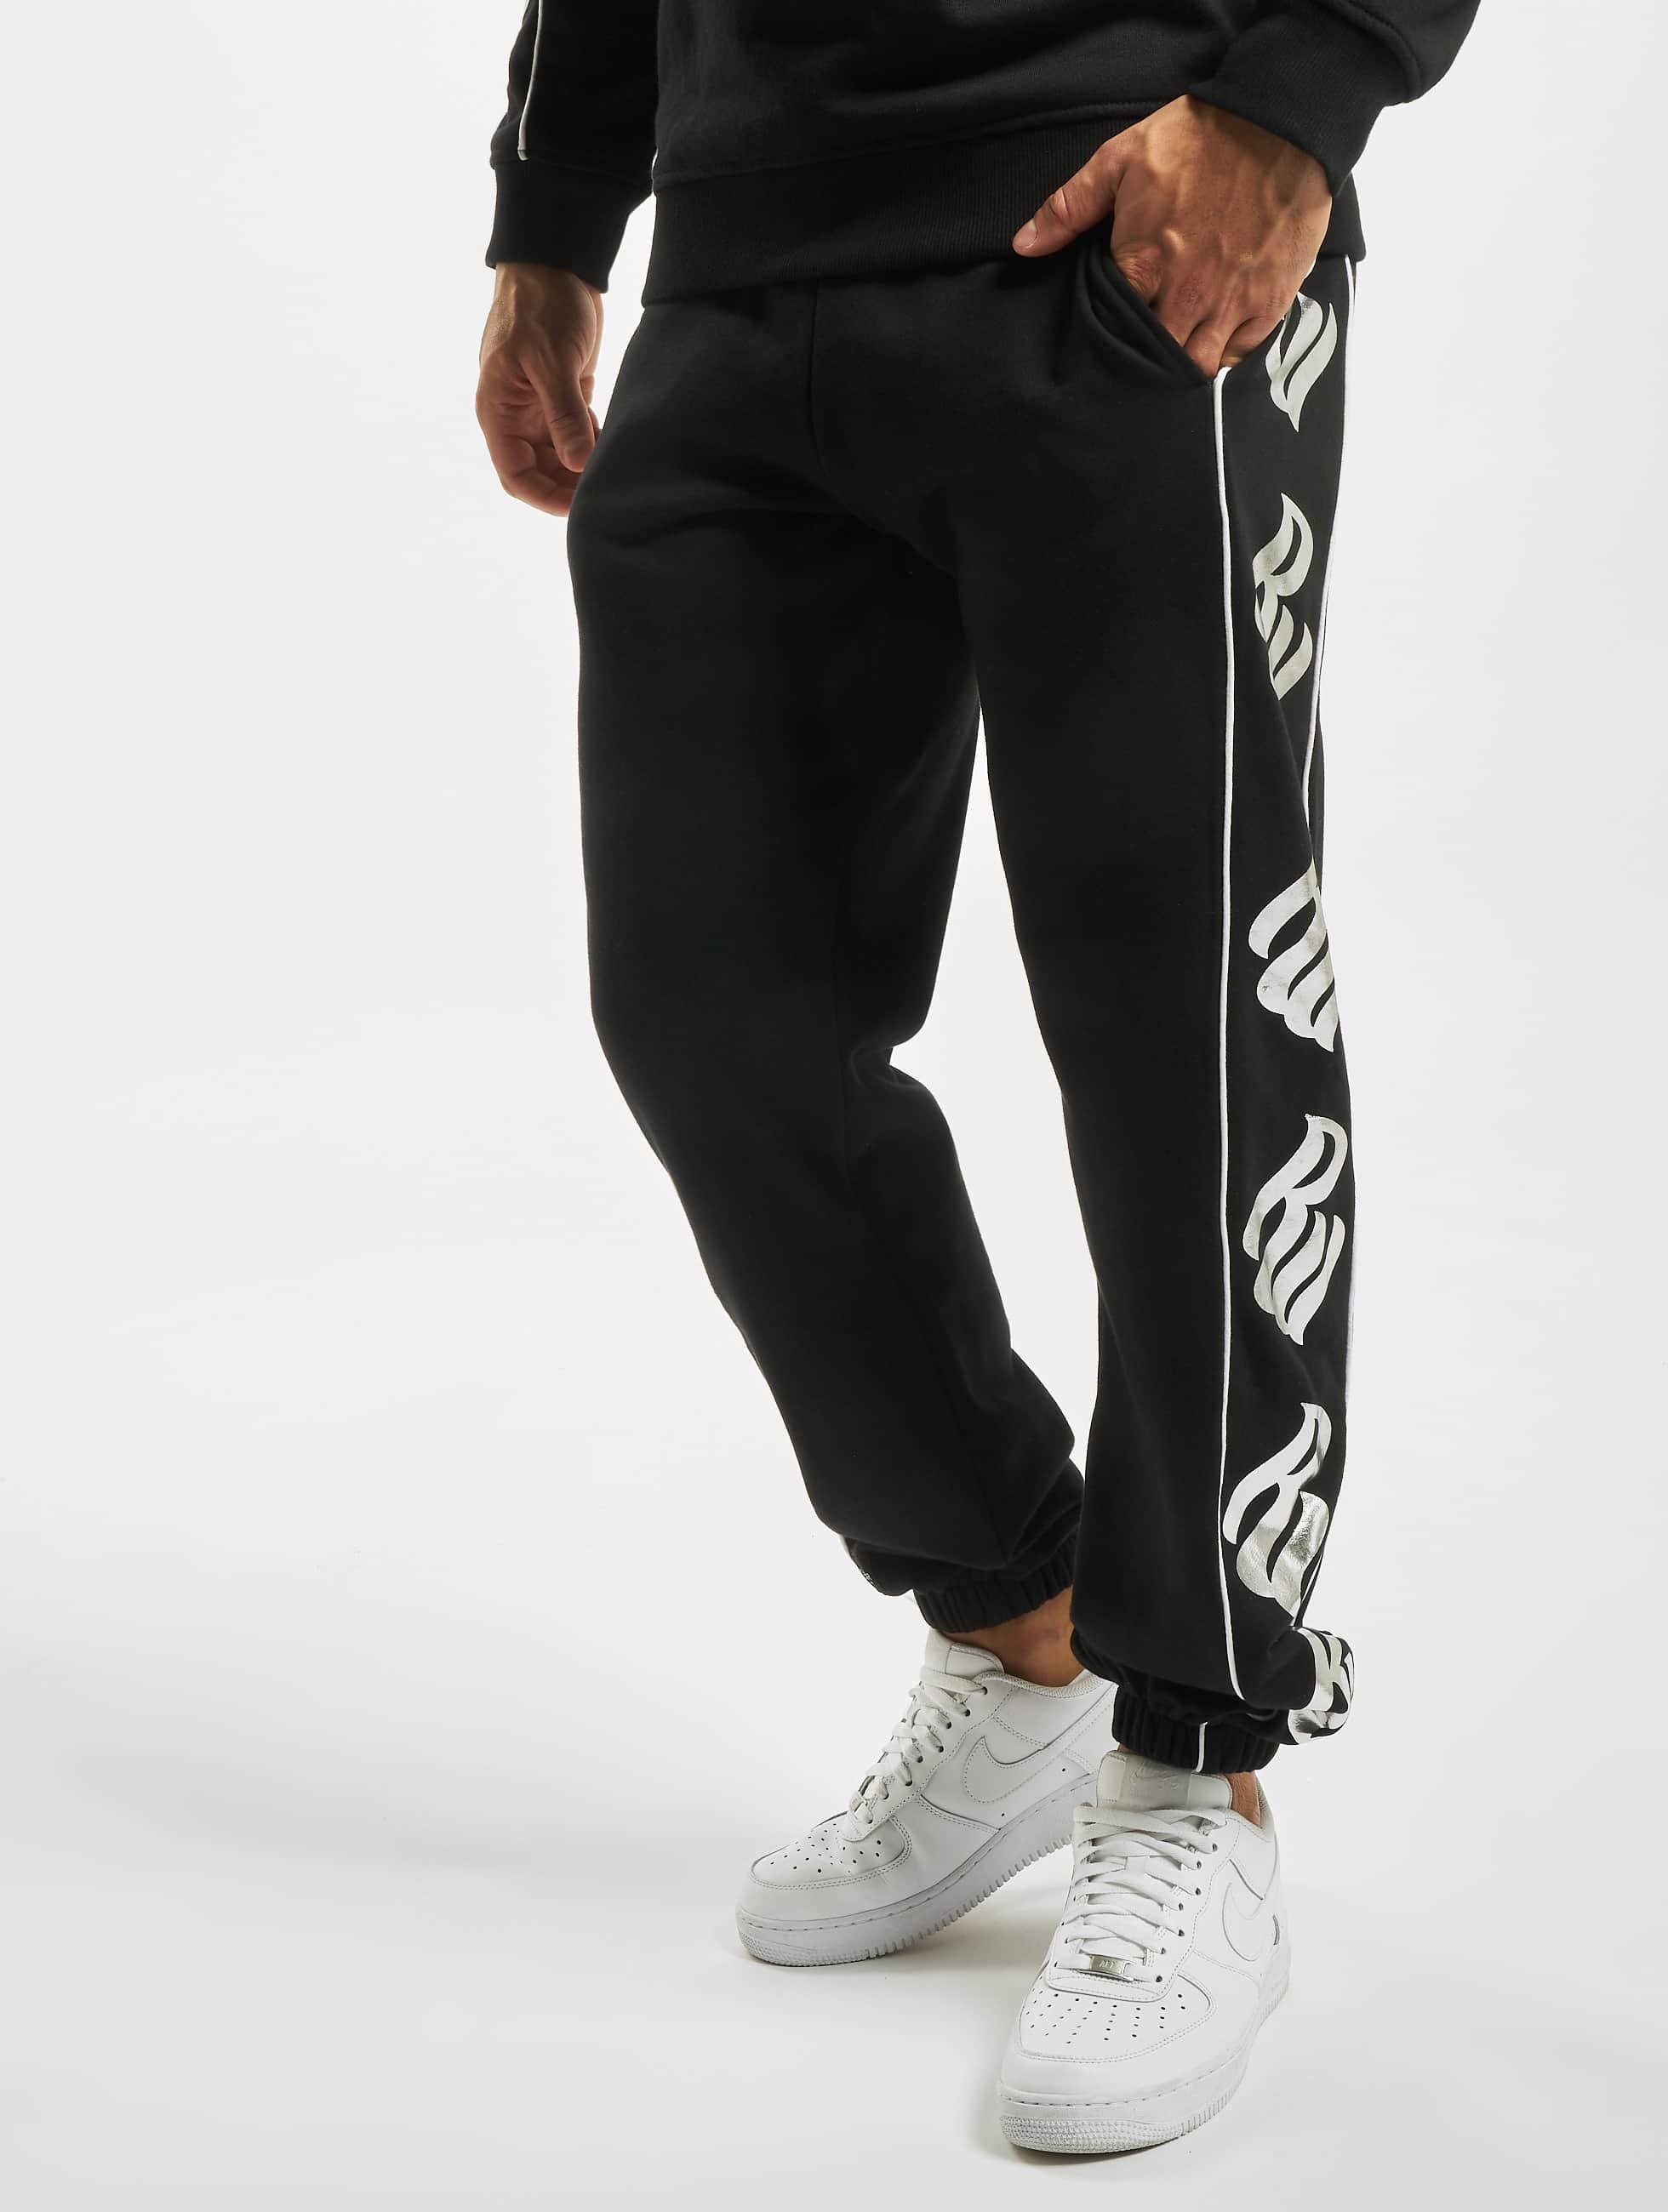 Rocawear / Sweat Pant Hudson in black 4XL